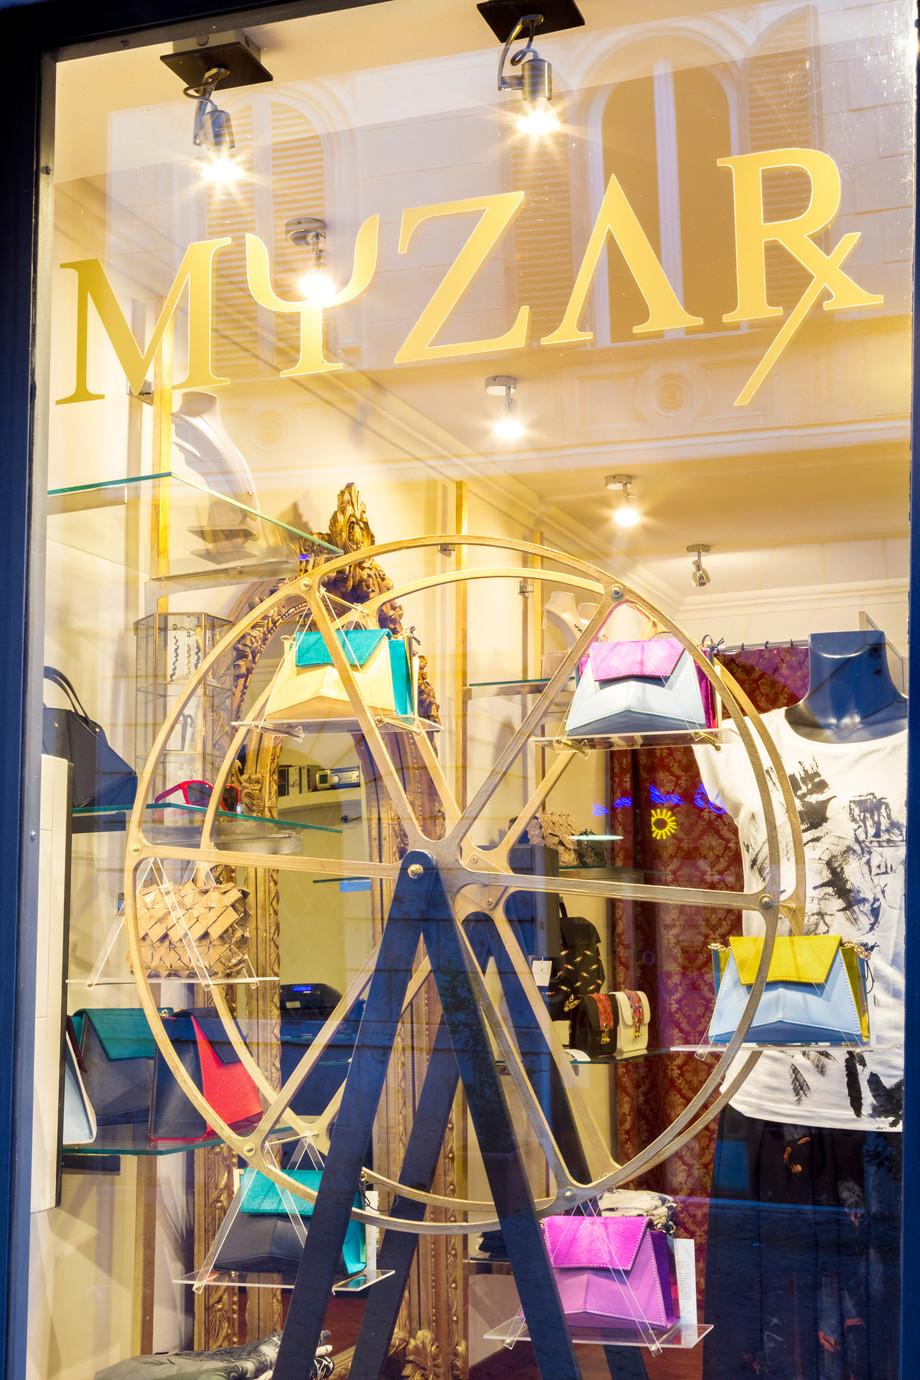 Myzar Concept Store: come Gabriele Girolamini esalta le eccellenze del Made in Italy / Myzar Concept